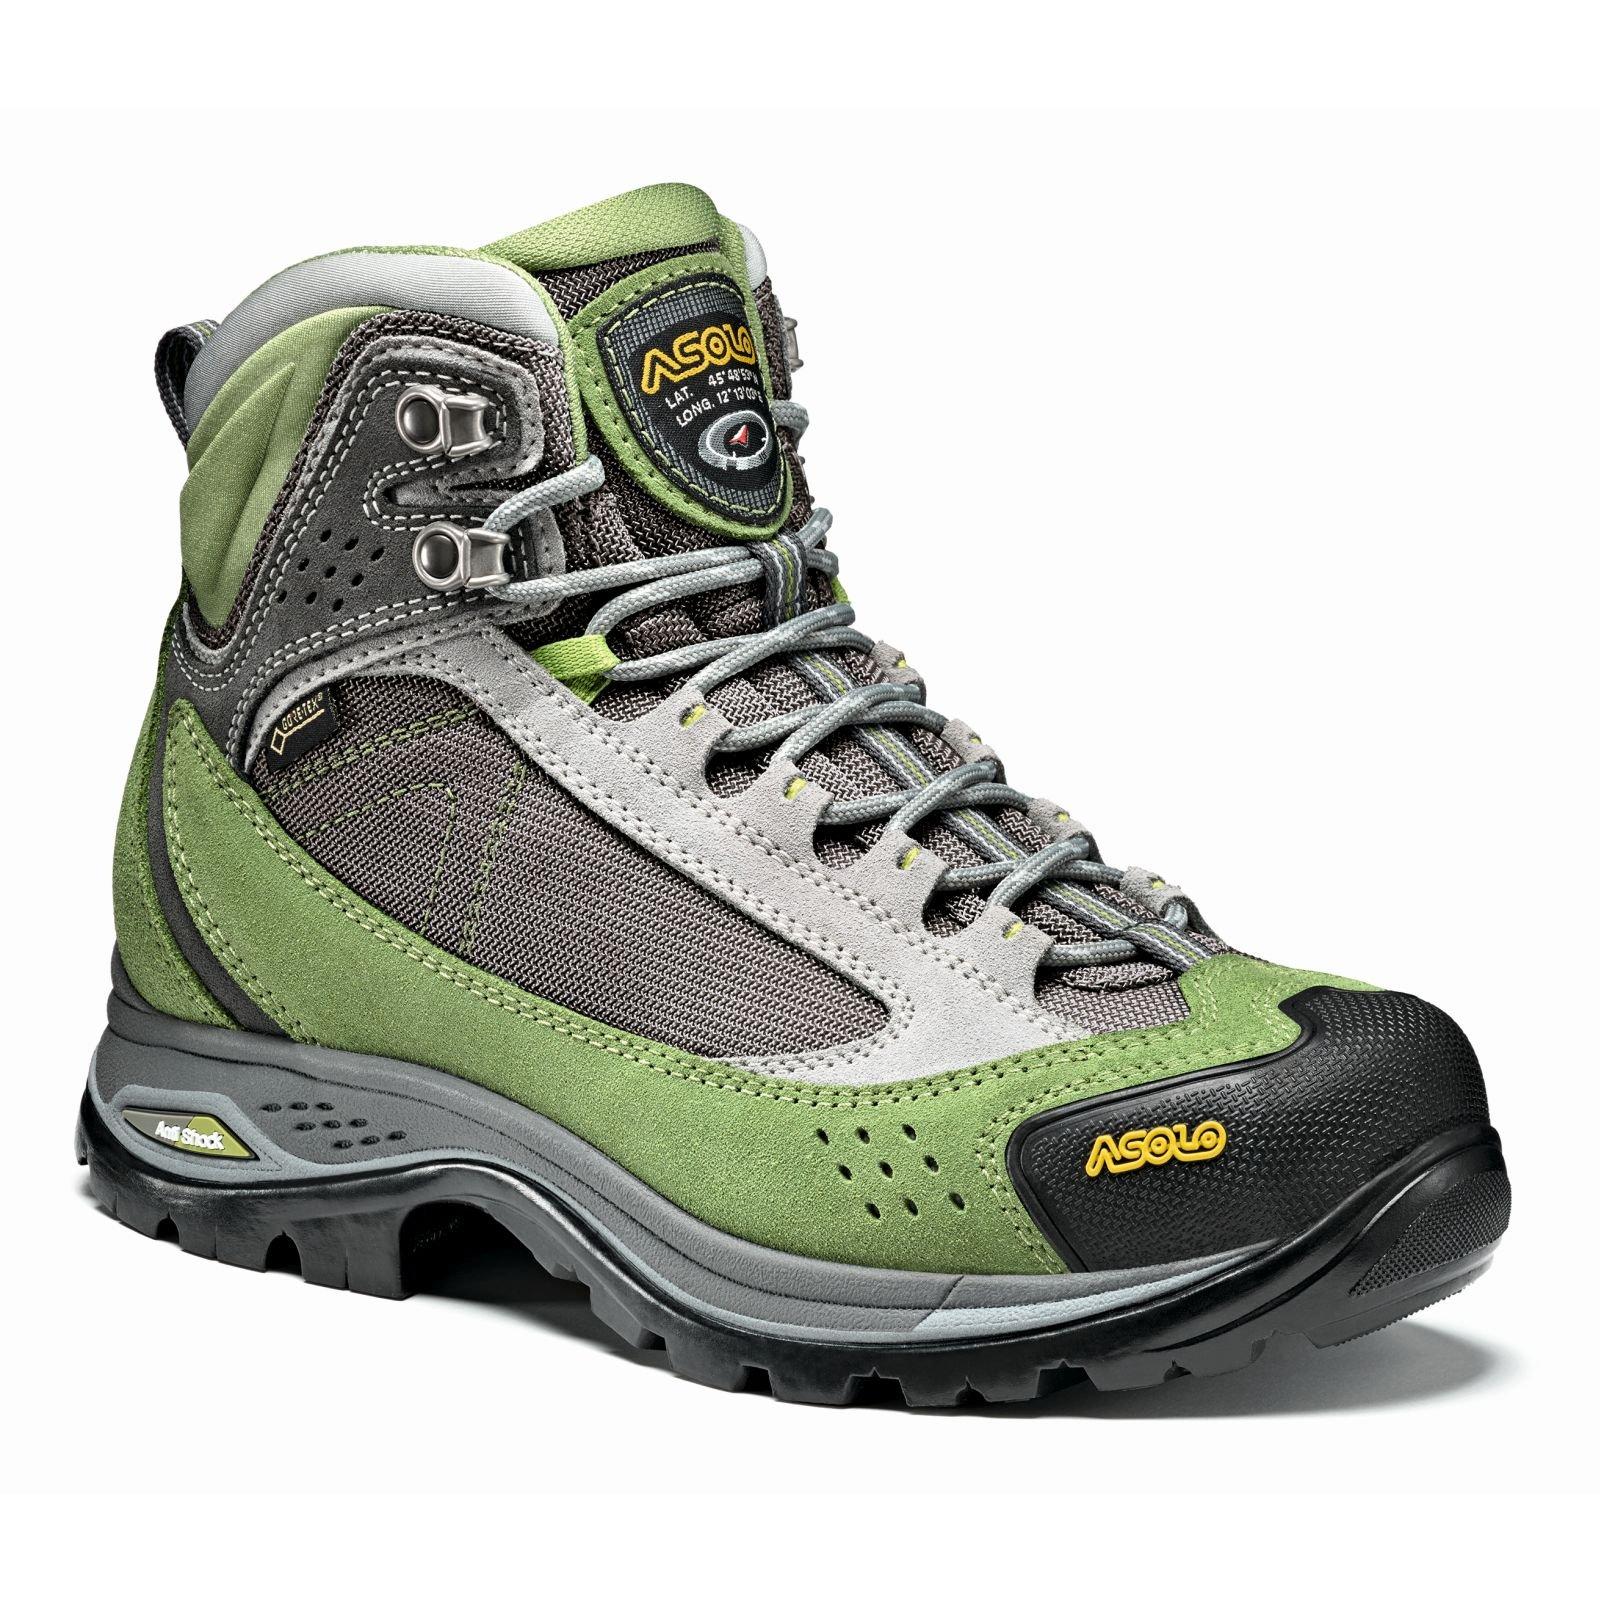 Asolo Women's Nilas Gv Hiking Boot English Ivy/Silver - 6.5